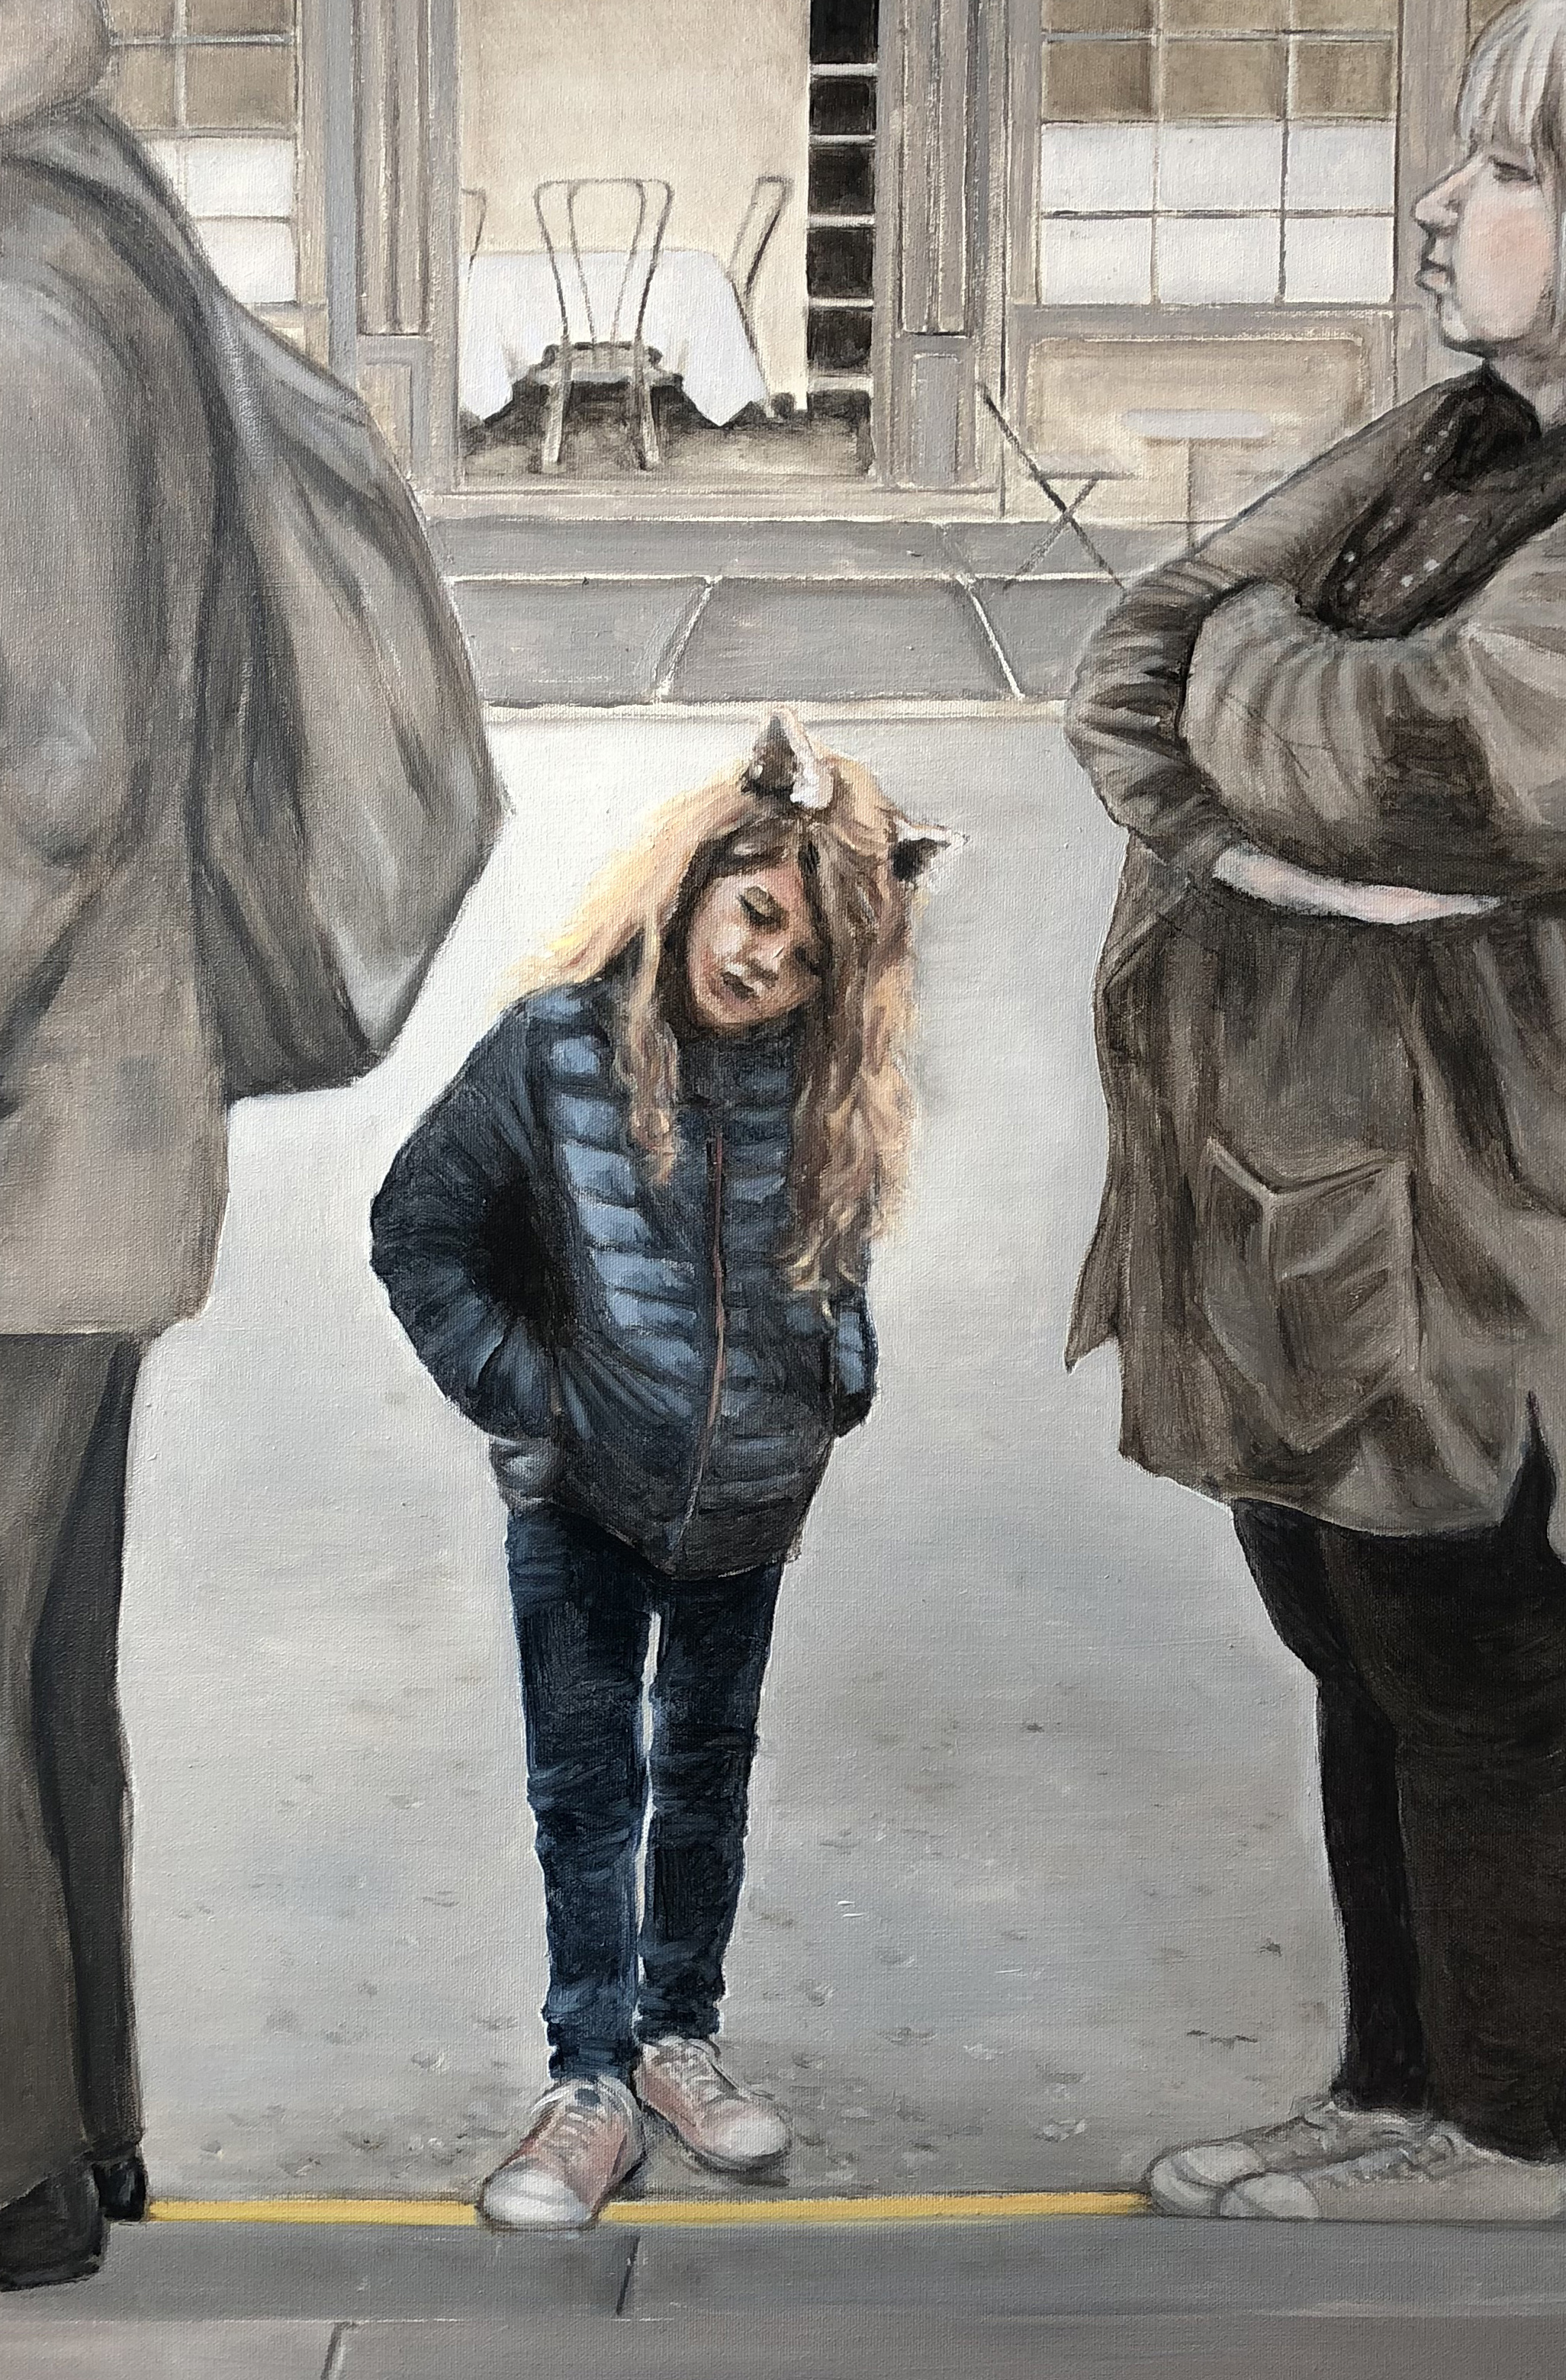 Girl On Line - London, 2018